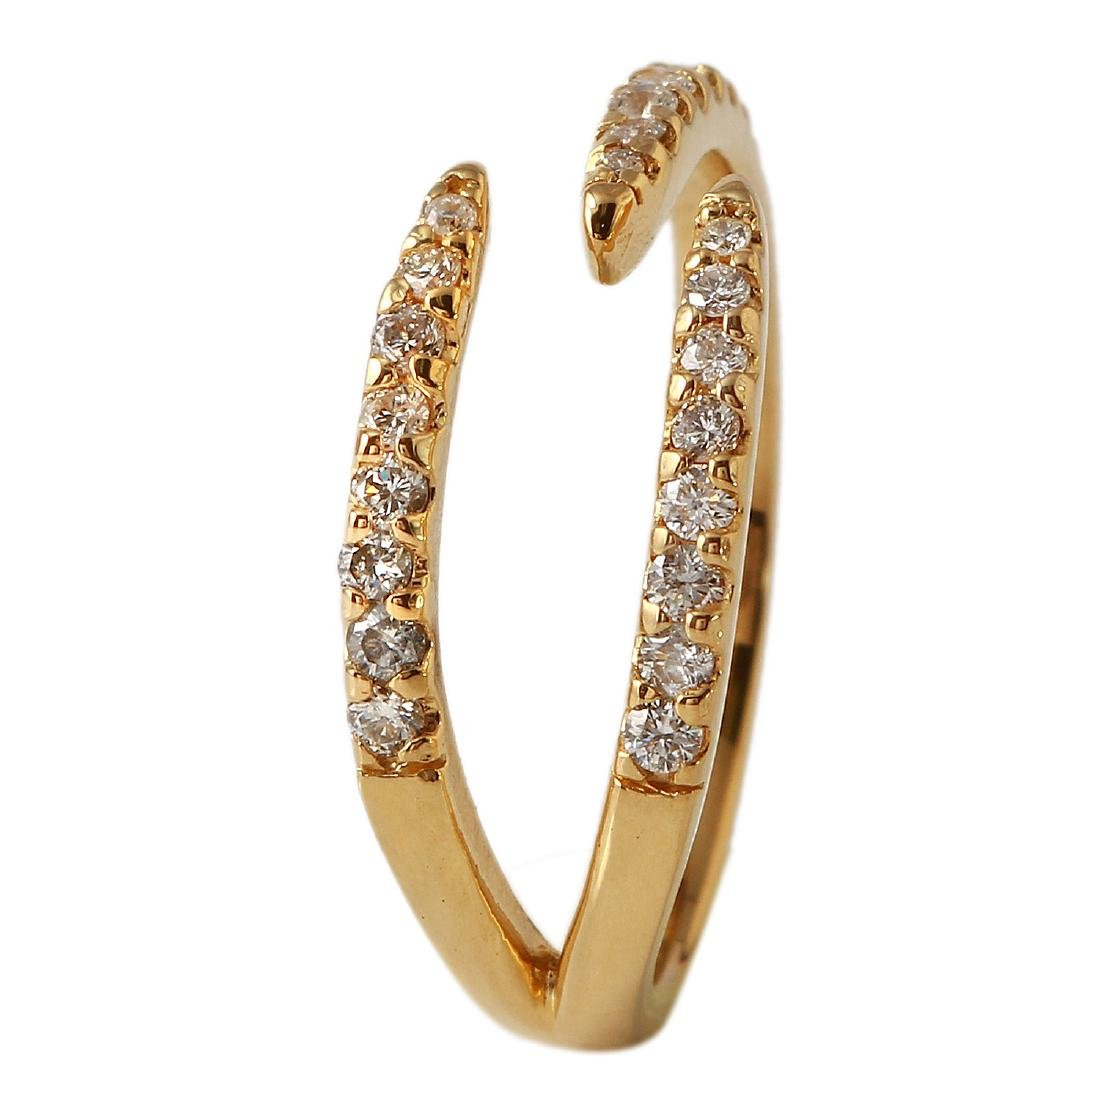 0.32 Carat Natural Diamond 18K Solid Yellow Gold Ring - 2